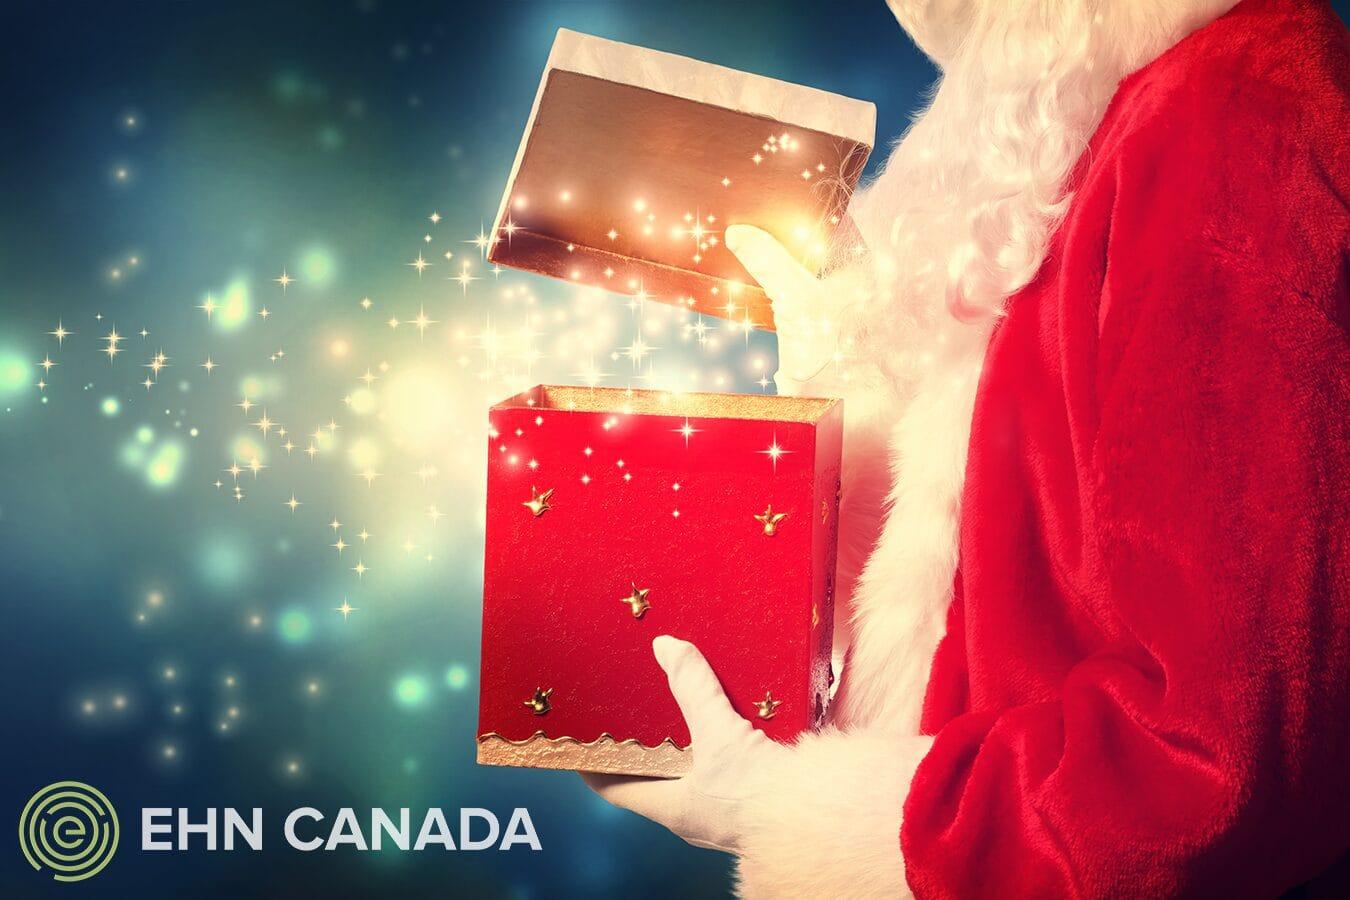 Celebrate Christmas at Edgewood Treatment Centre Drug Rehab British Columbia